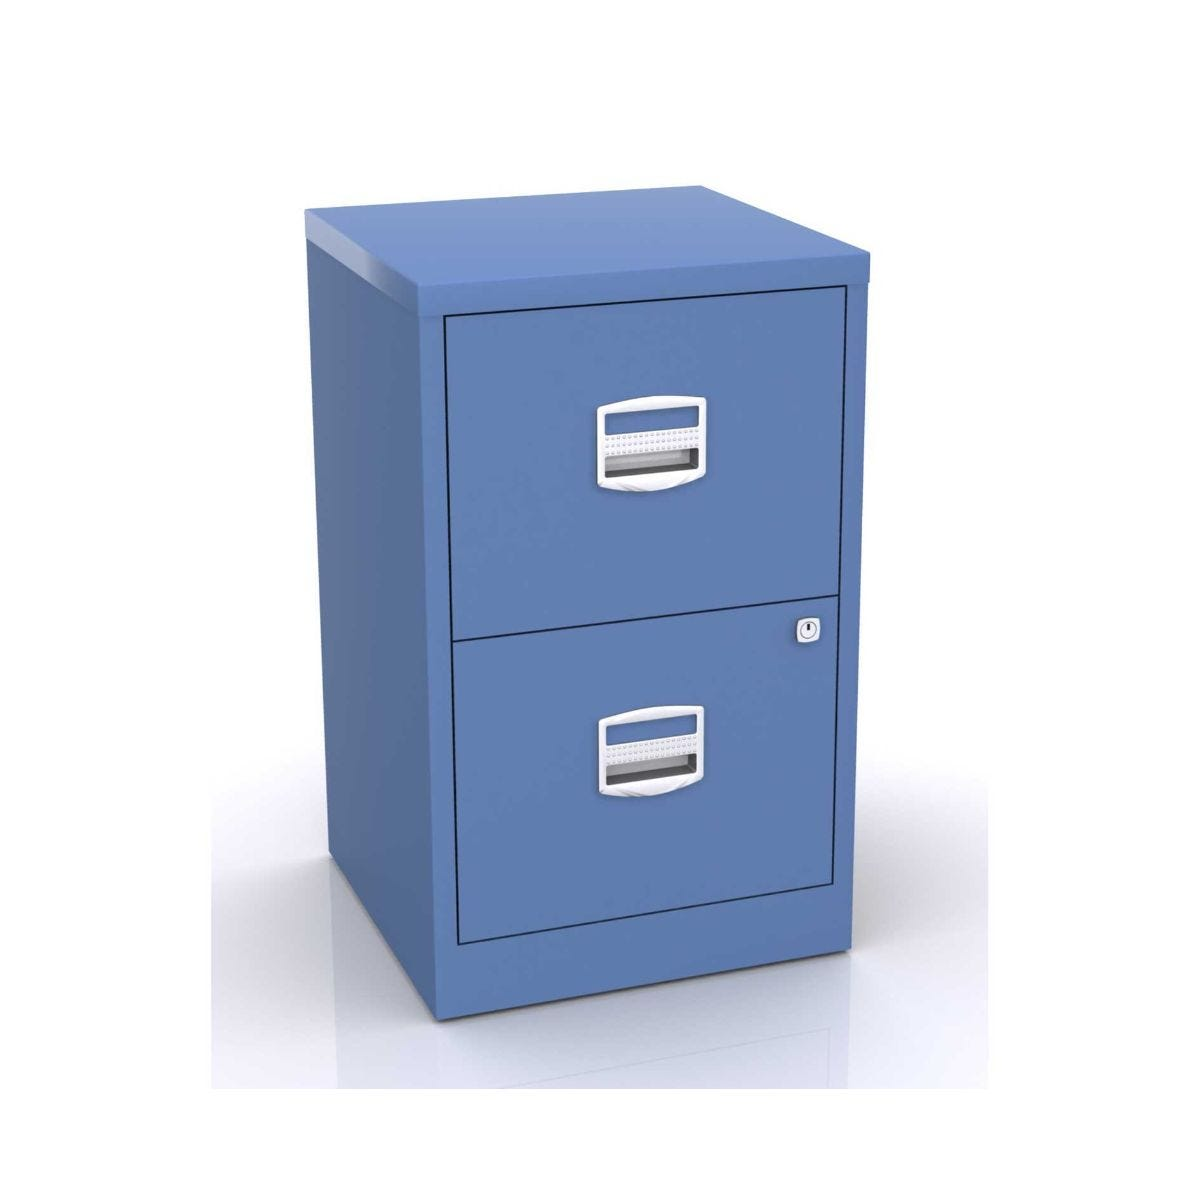 Bisley Metal Filing Cabinet 2 Drawer A4 H670xw410xd400mm